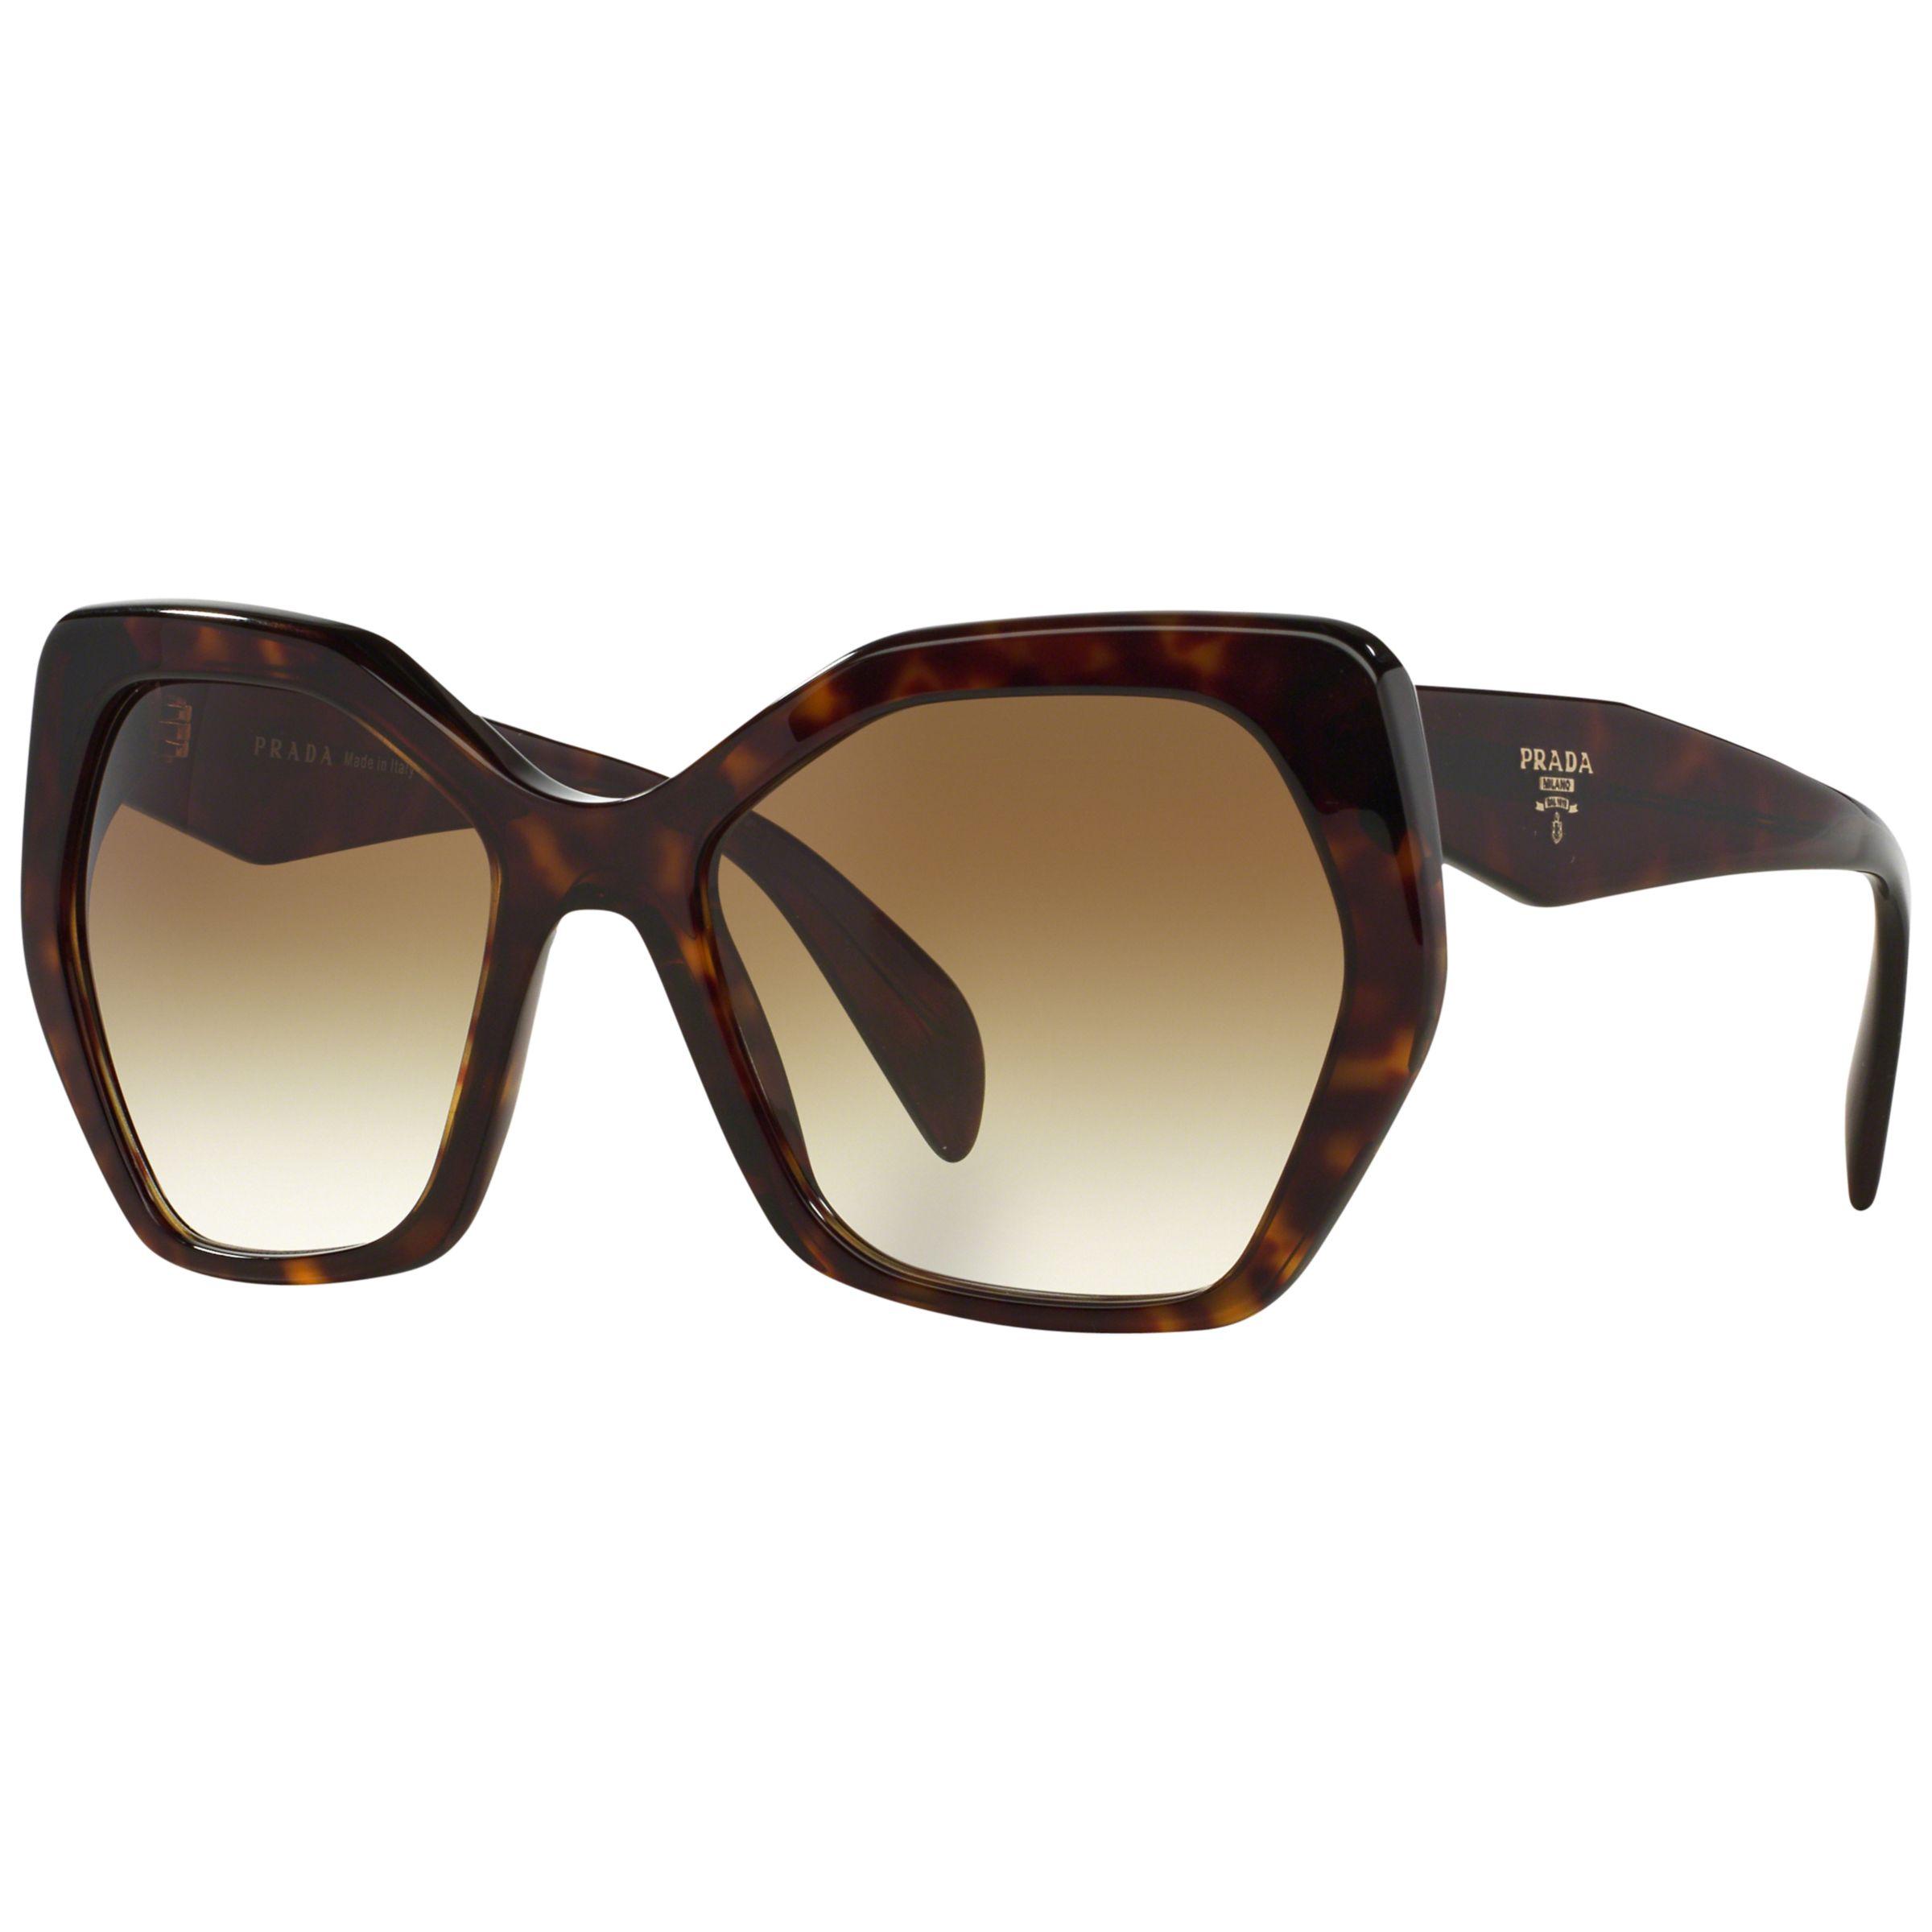 Prada Glasses Frame Malaysia : Buy Prada PR16RS Irregular Framed Sunglasses John Lewis